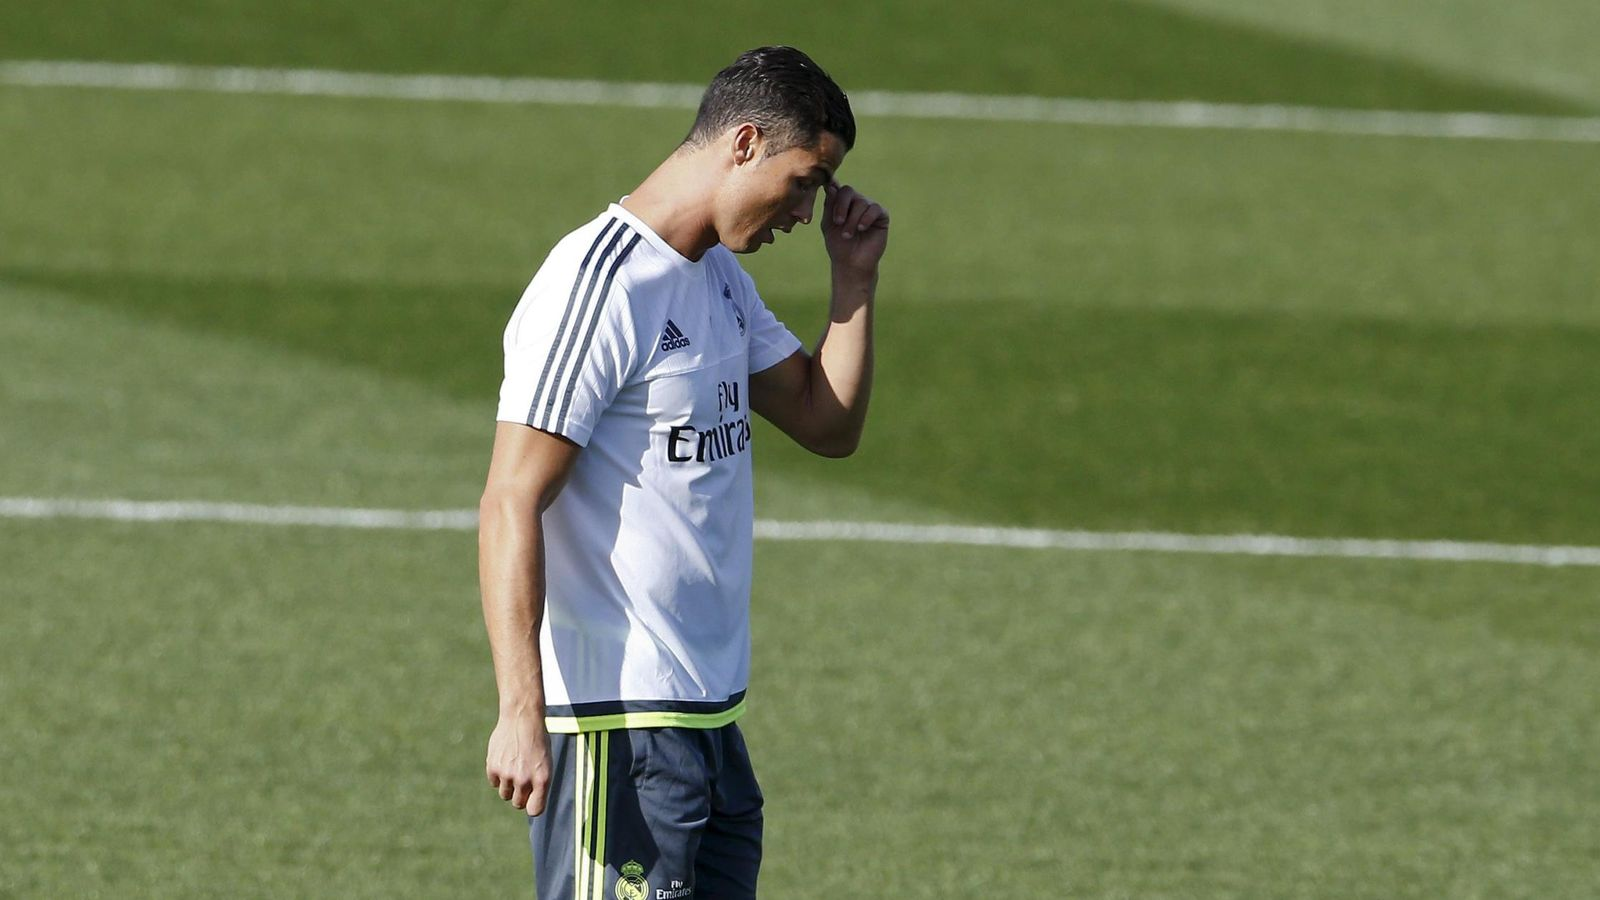 Foto: El futbolista Cristiano Ronaldo. (Reuters)